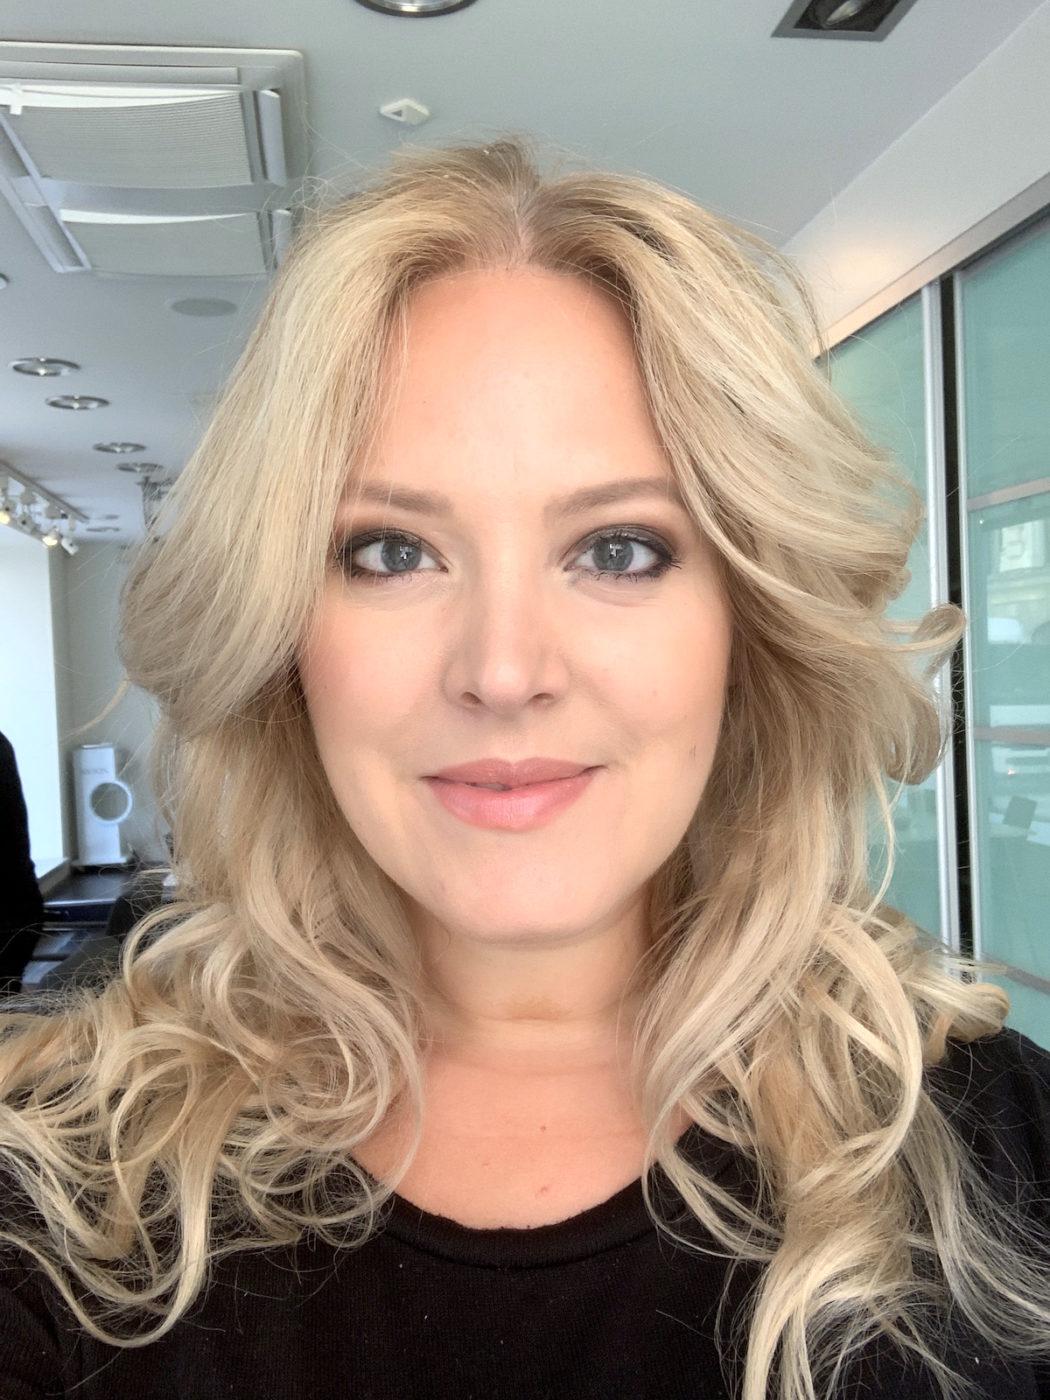 Elin Fagerberg testar ghd Oracle. Håret får mycket volym